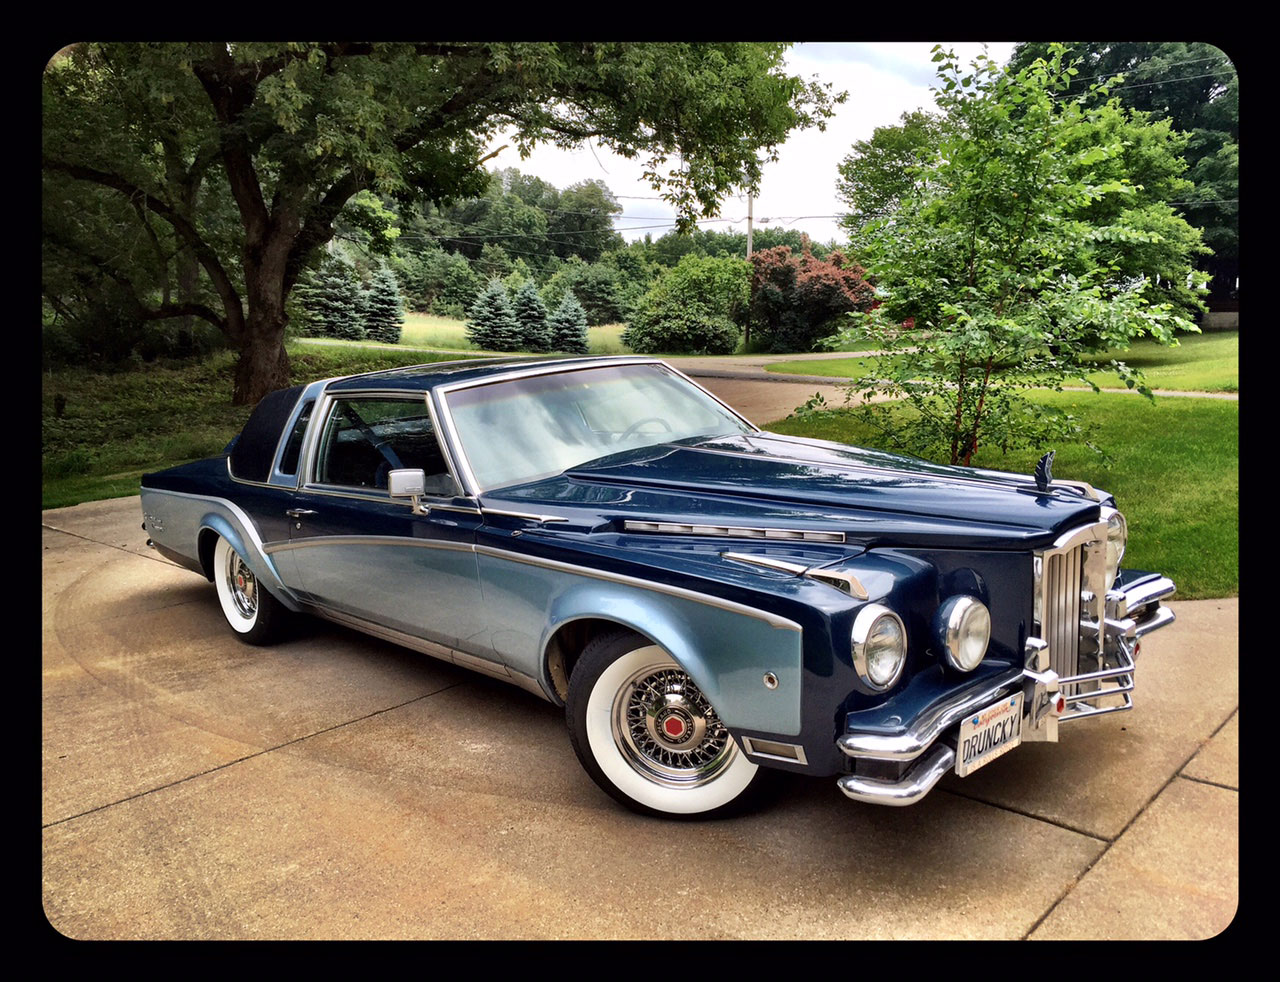 Classic Replica Cars For Sale In Texas